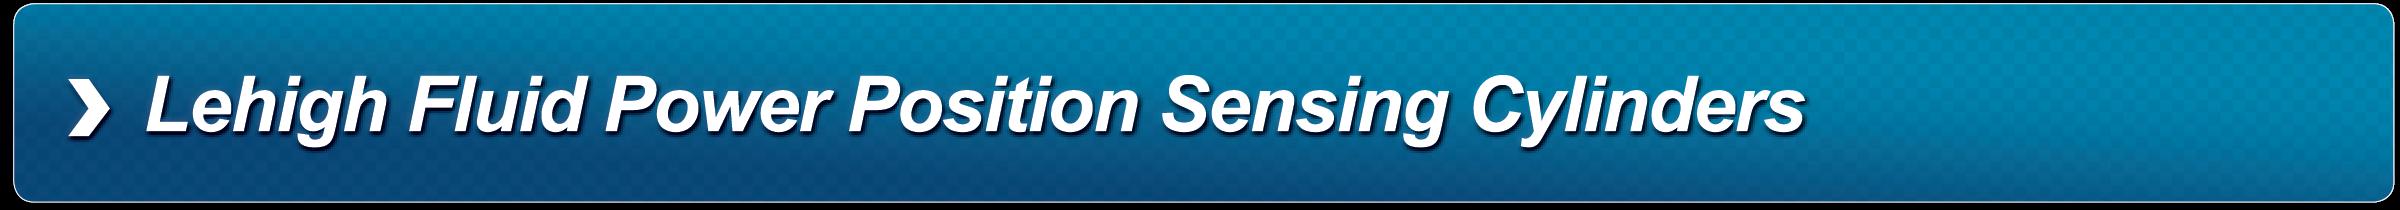 Lehigh Fluid Power Position Sensing Cylinders